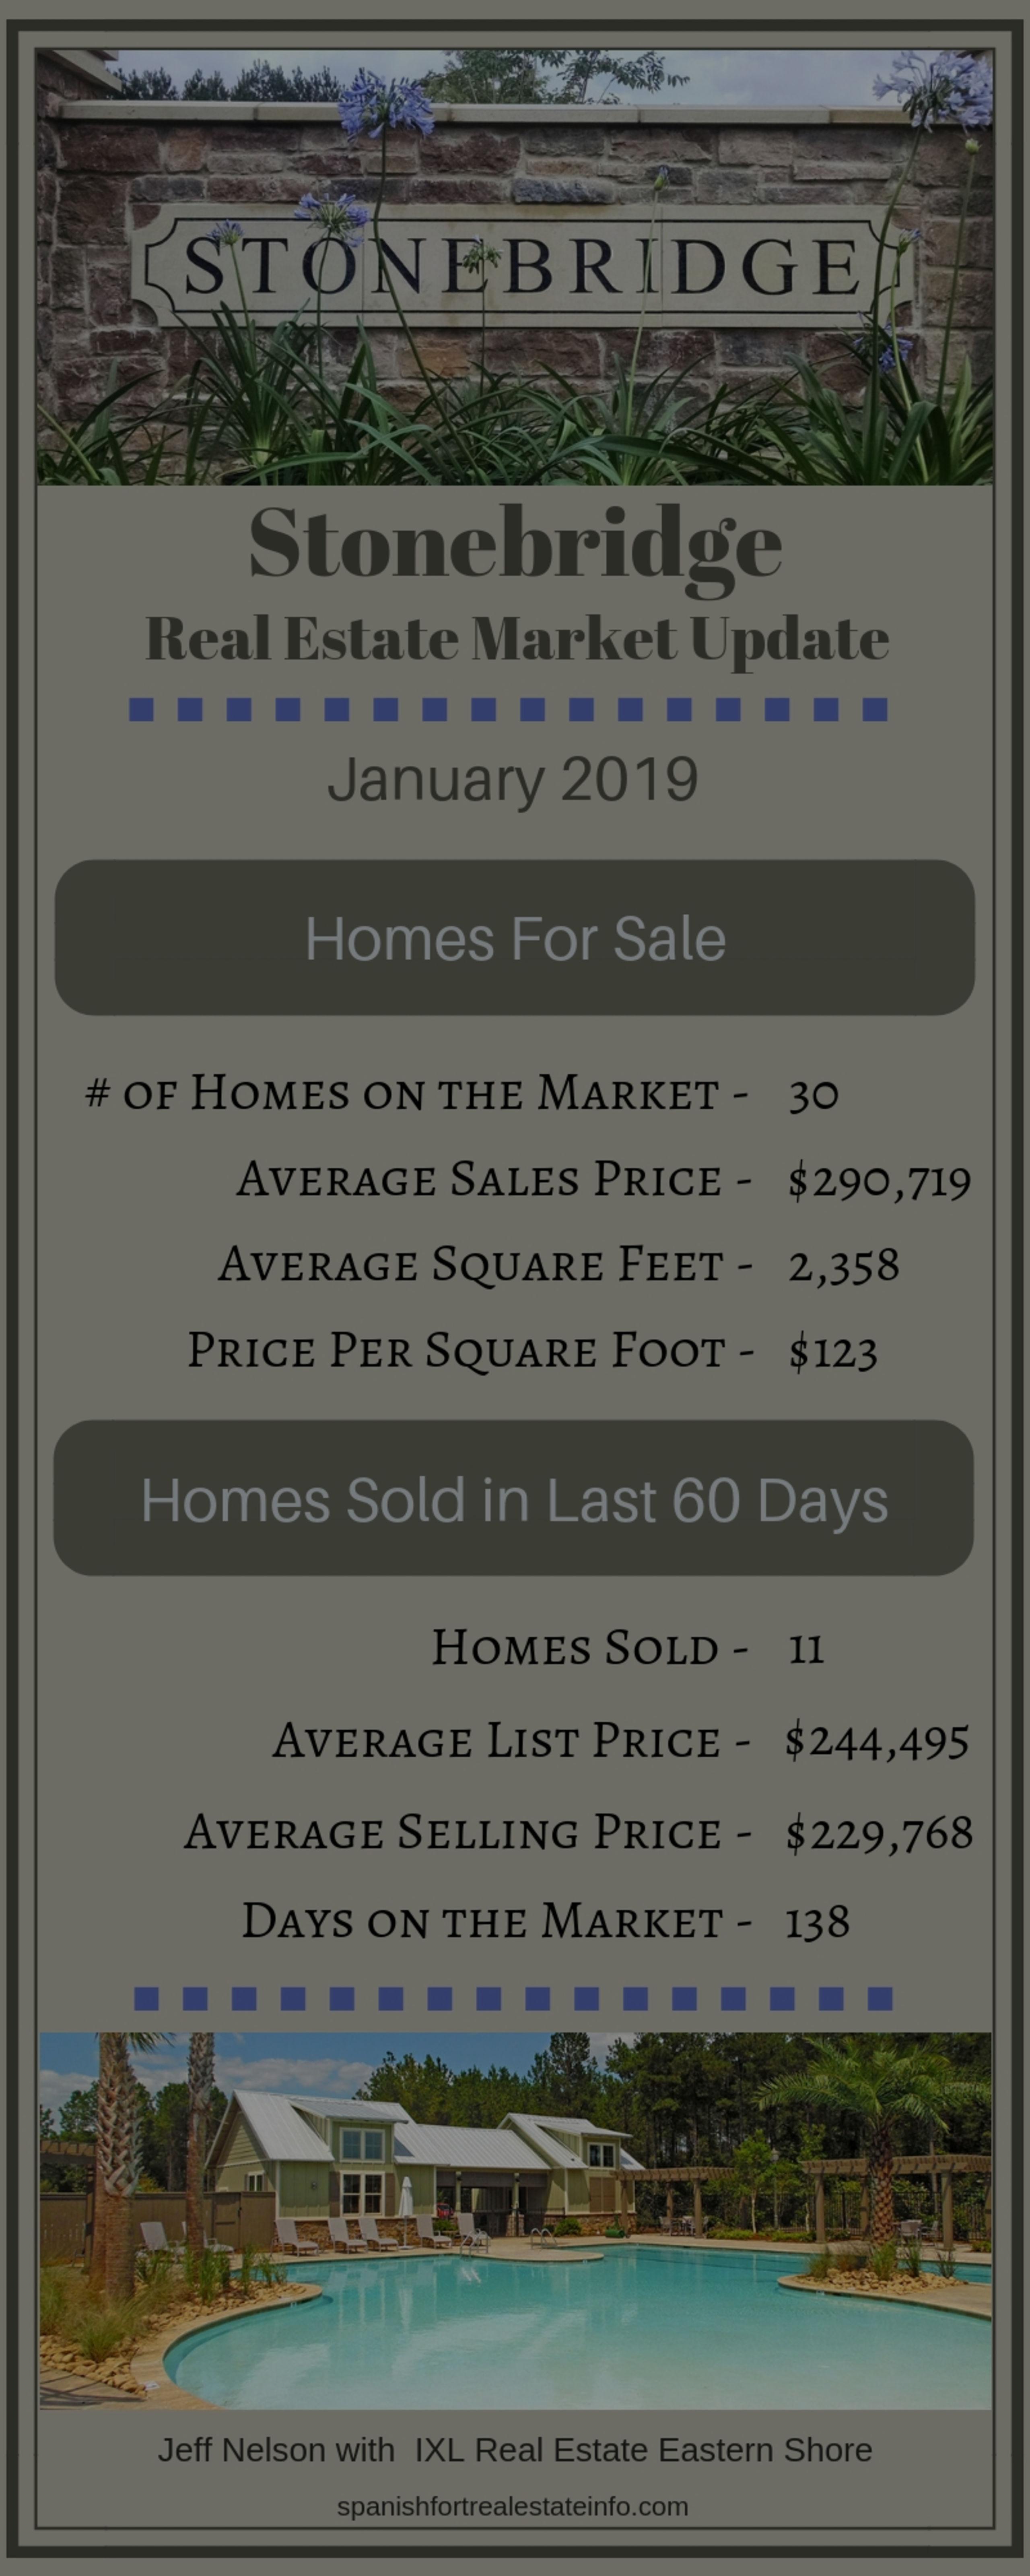 Stonebridge Real Estate Market Update – January 2019